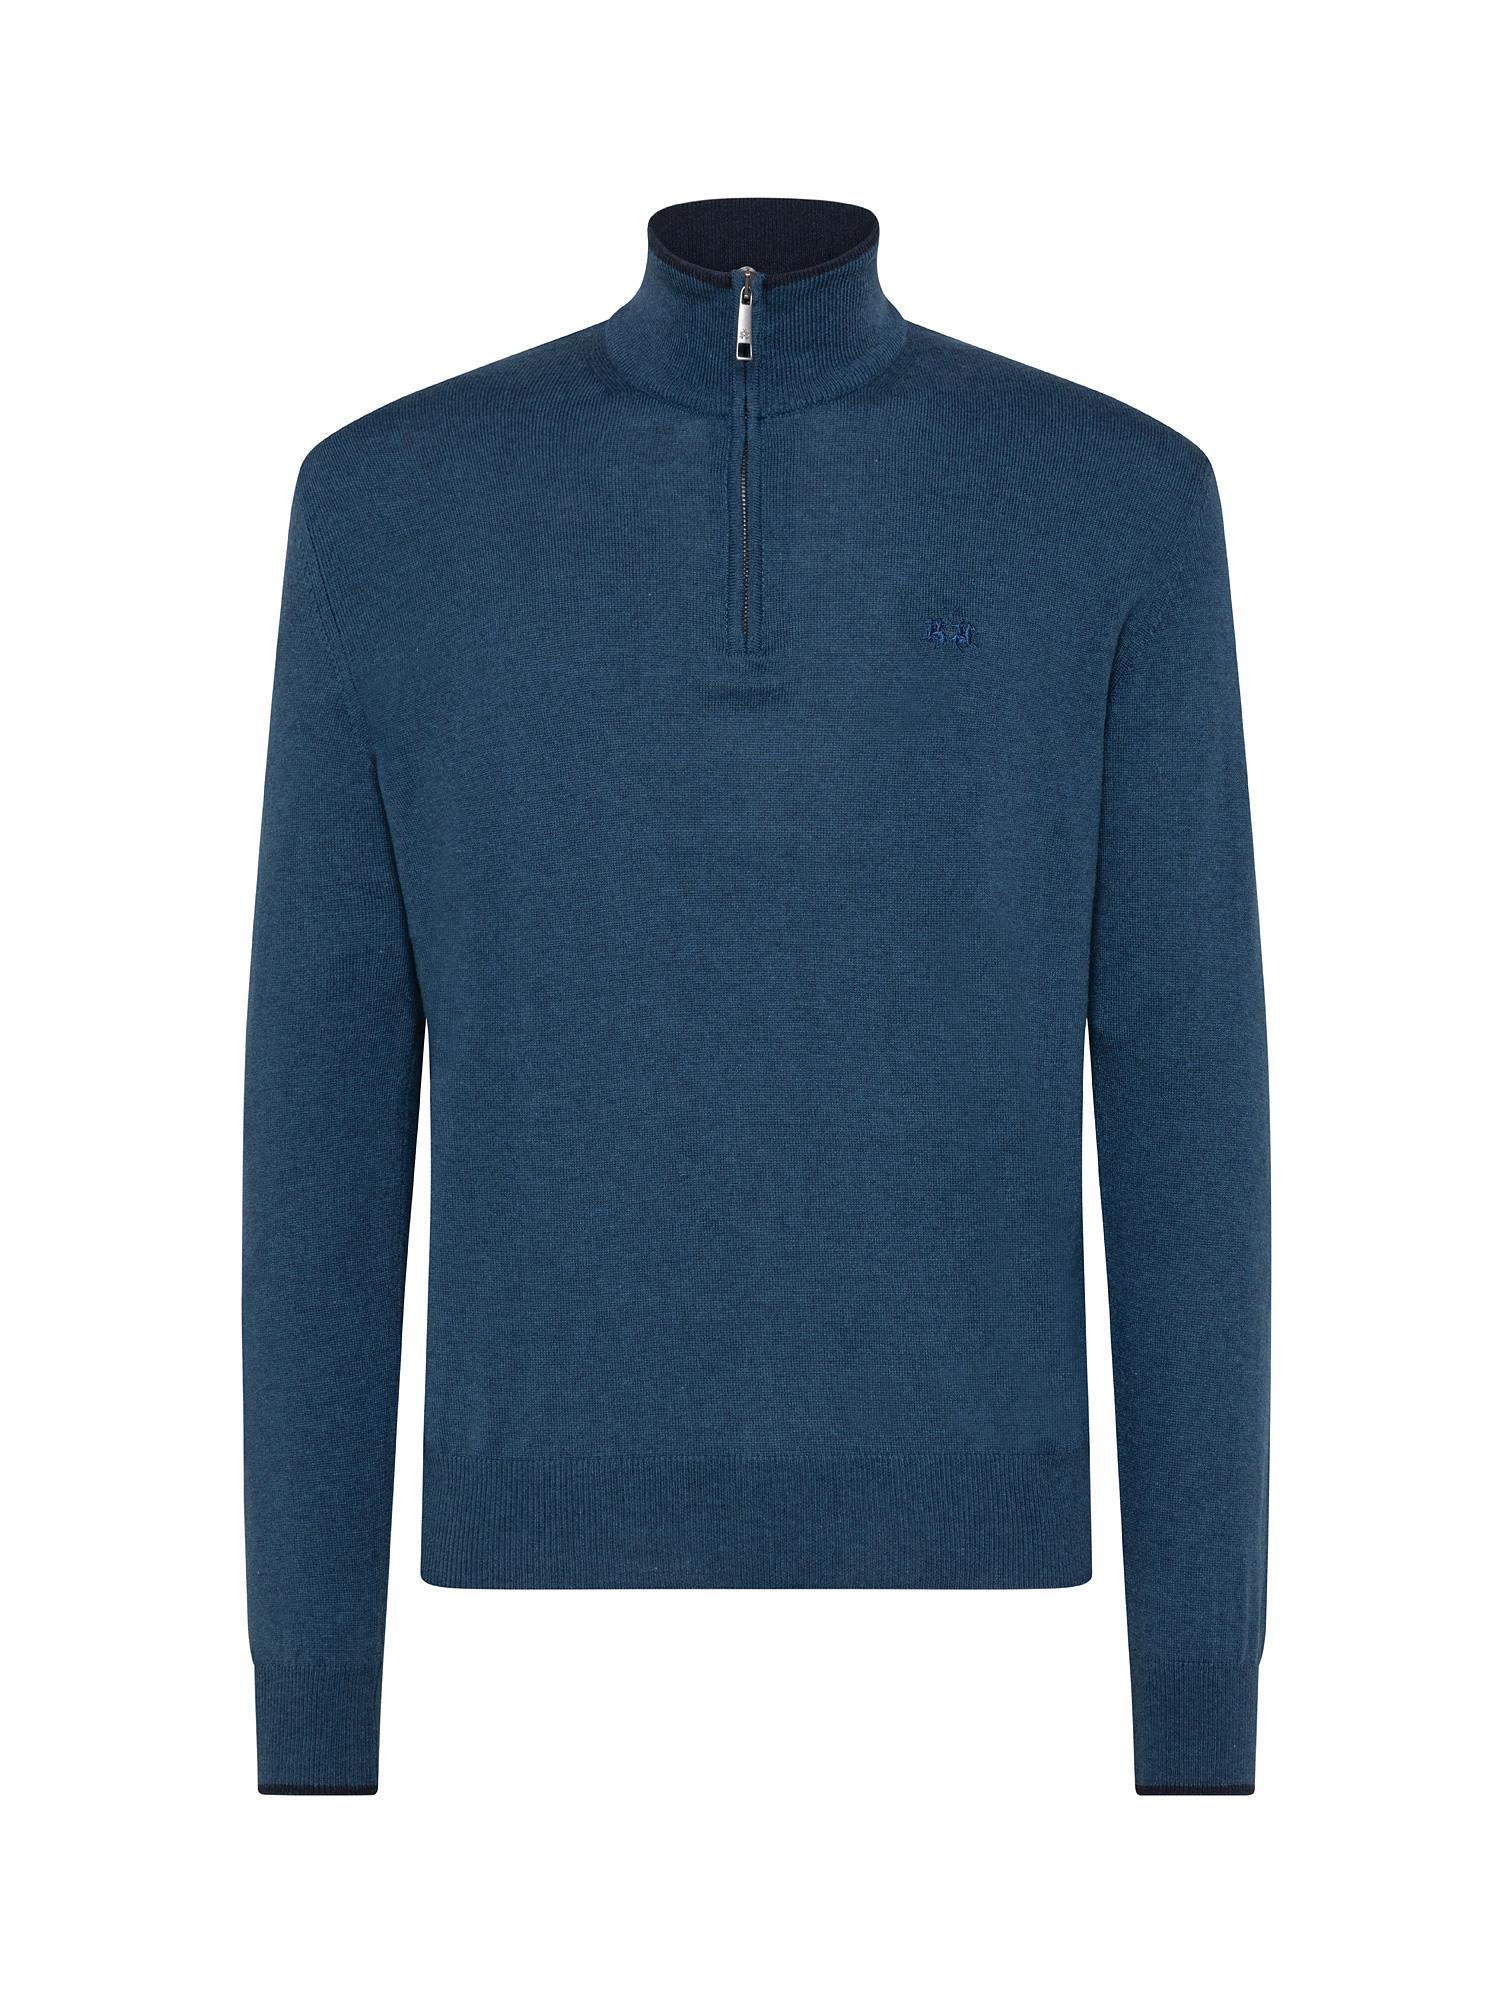 Maglia uomo a maniche lunghe in cotone misto lana, Blu, large image number 0